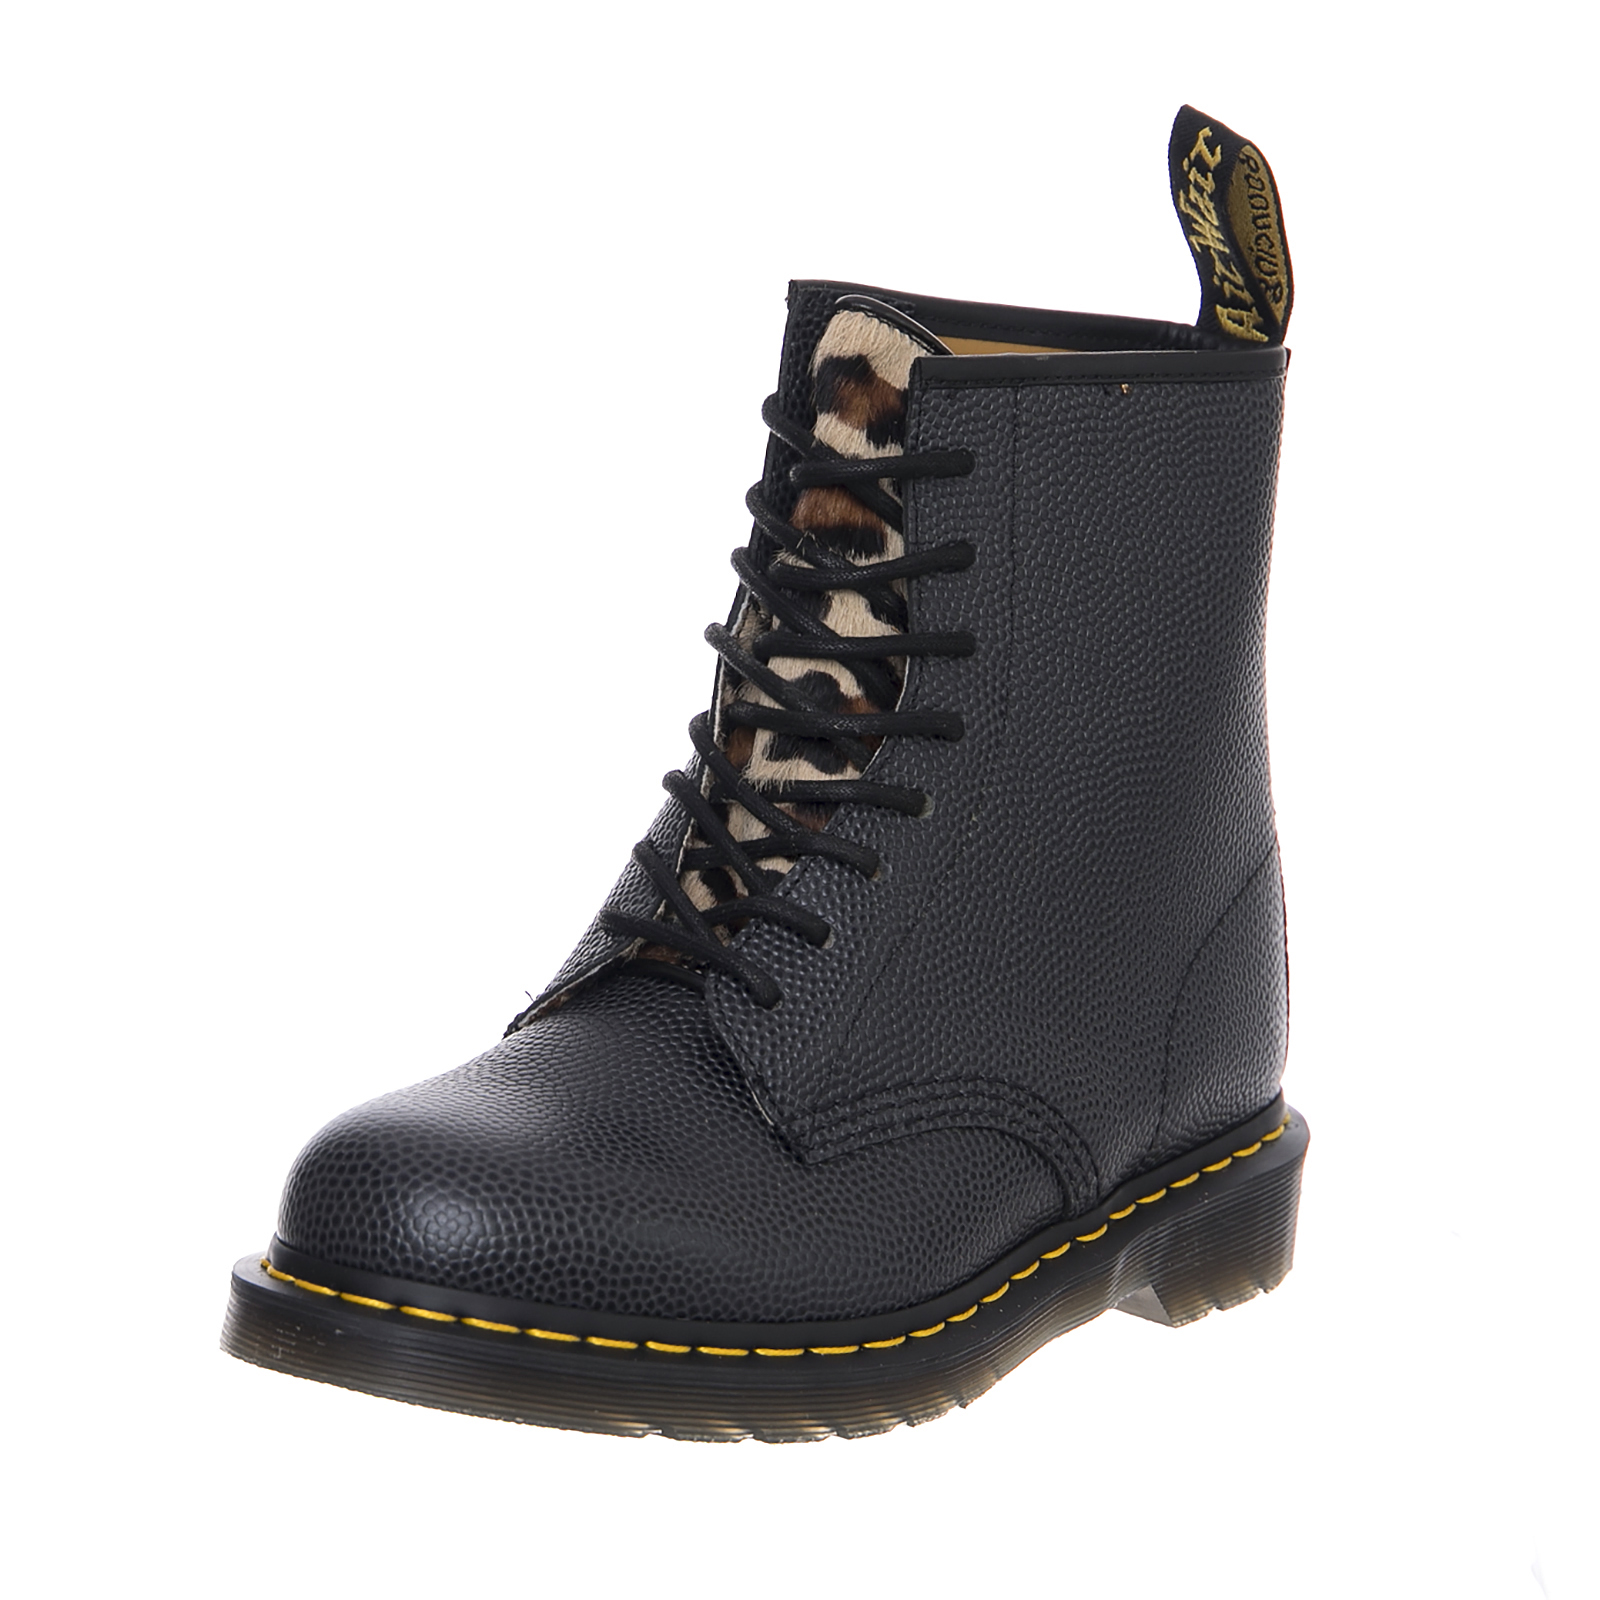 dr martens boots 1460 black